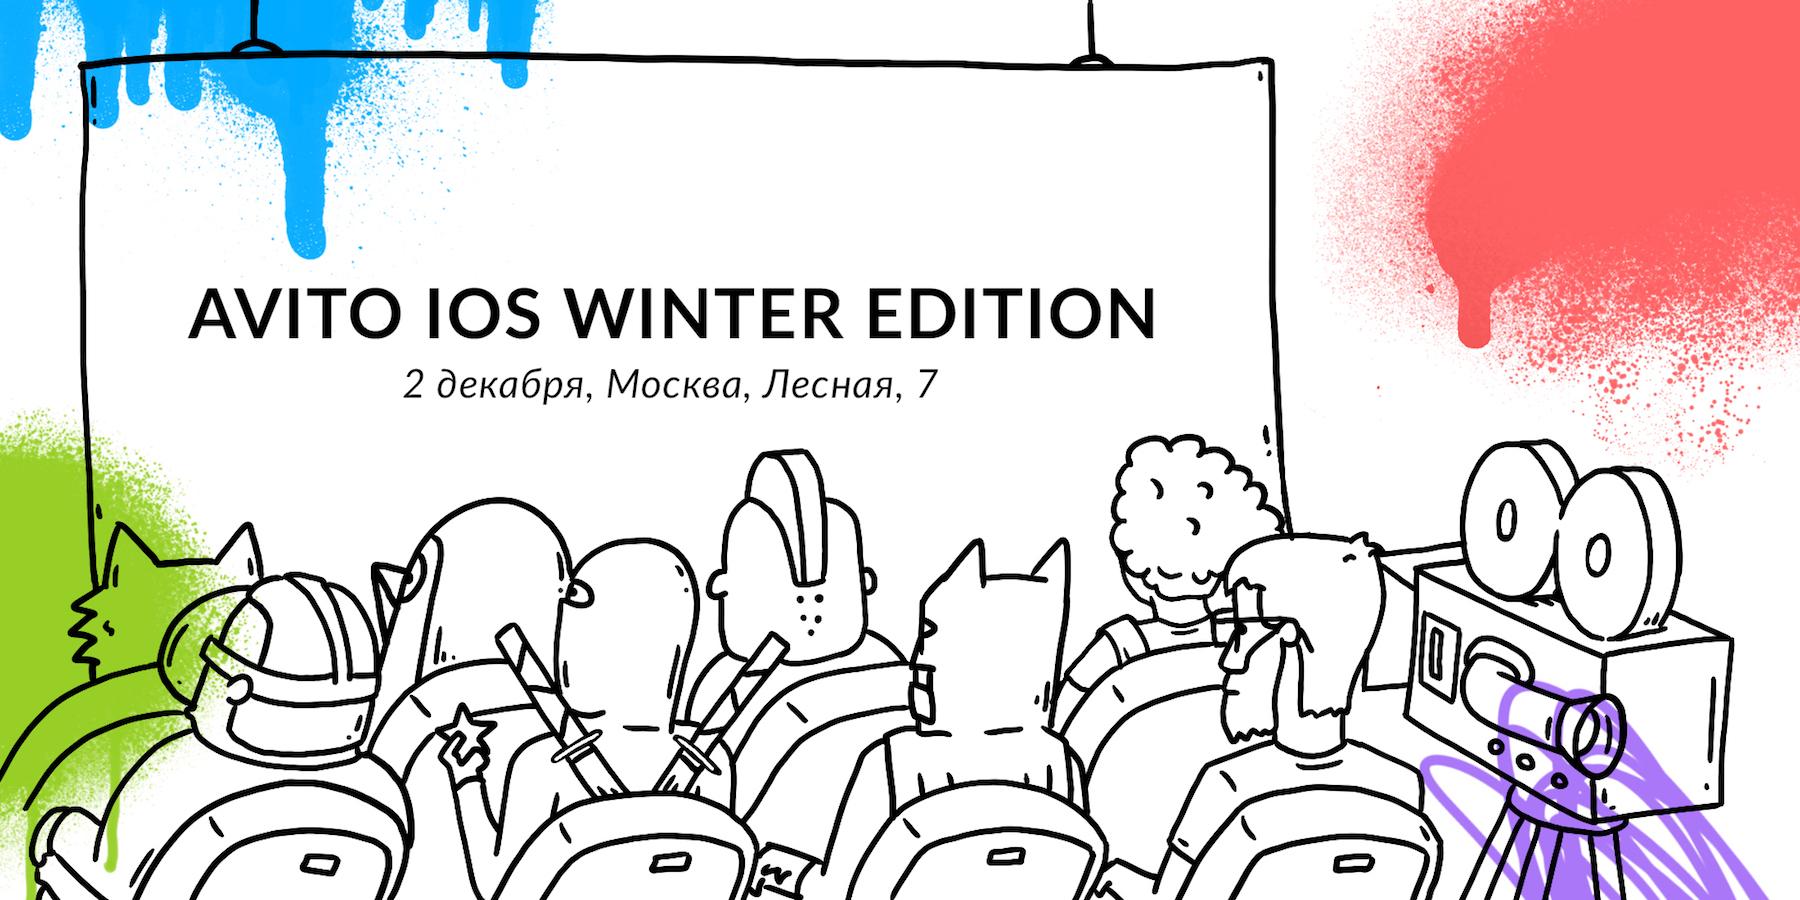 Avito iOS Meetup: Winter Edition